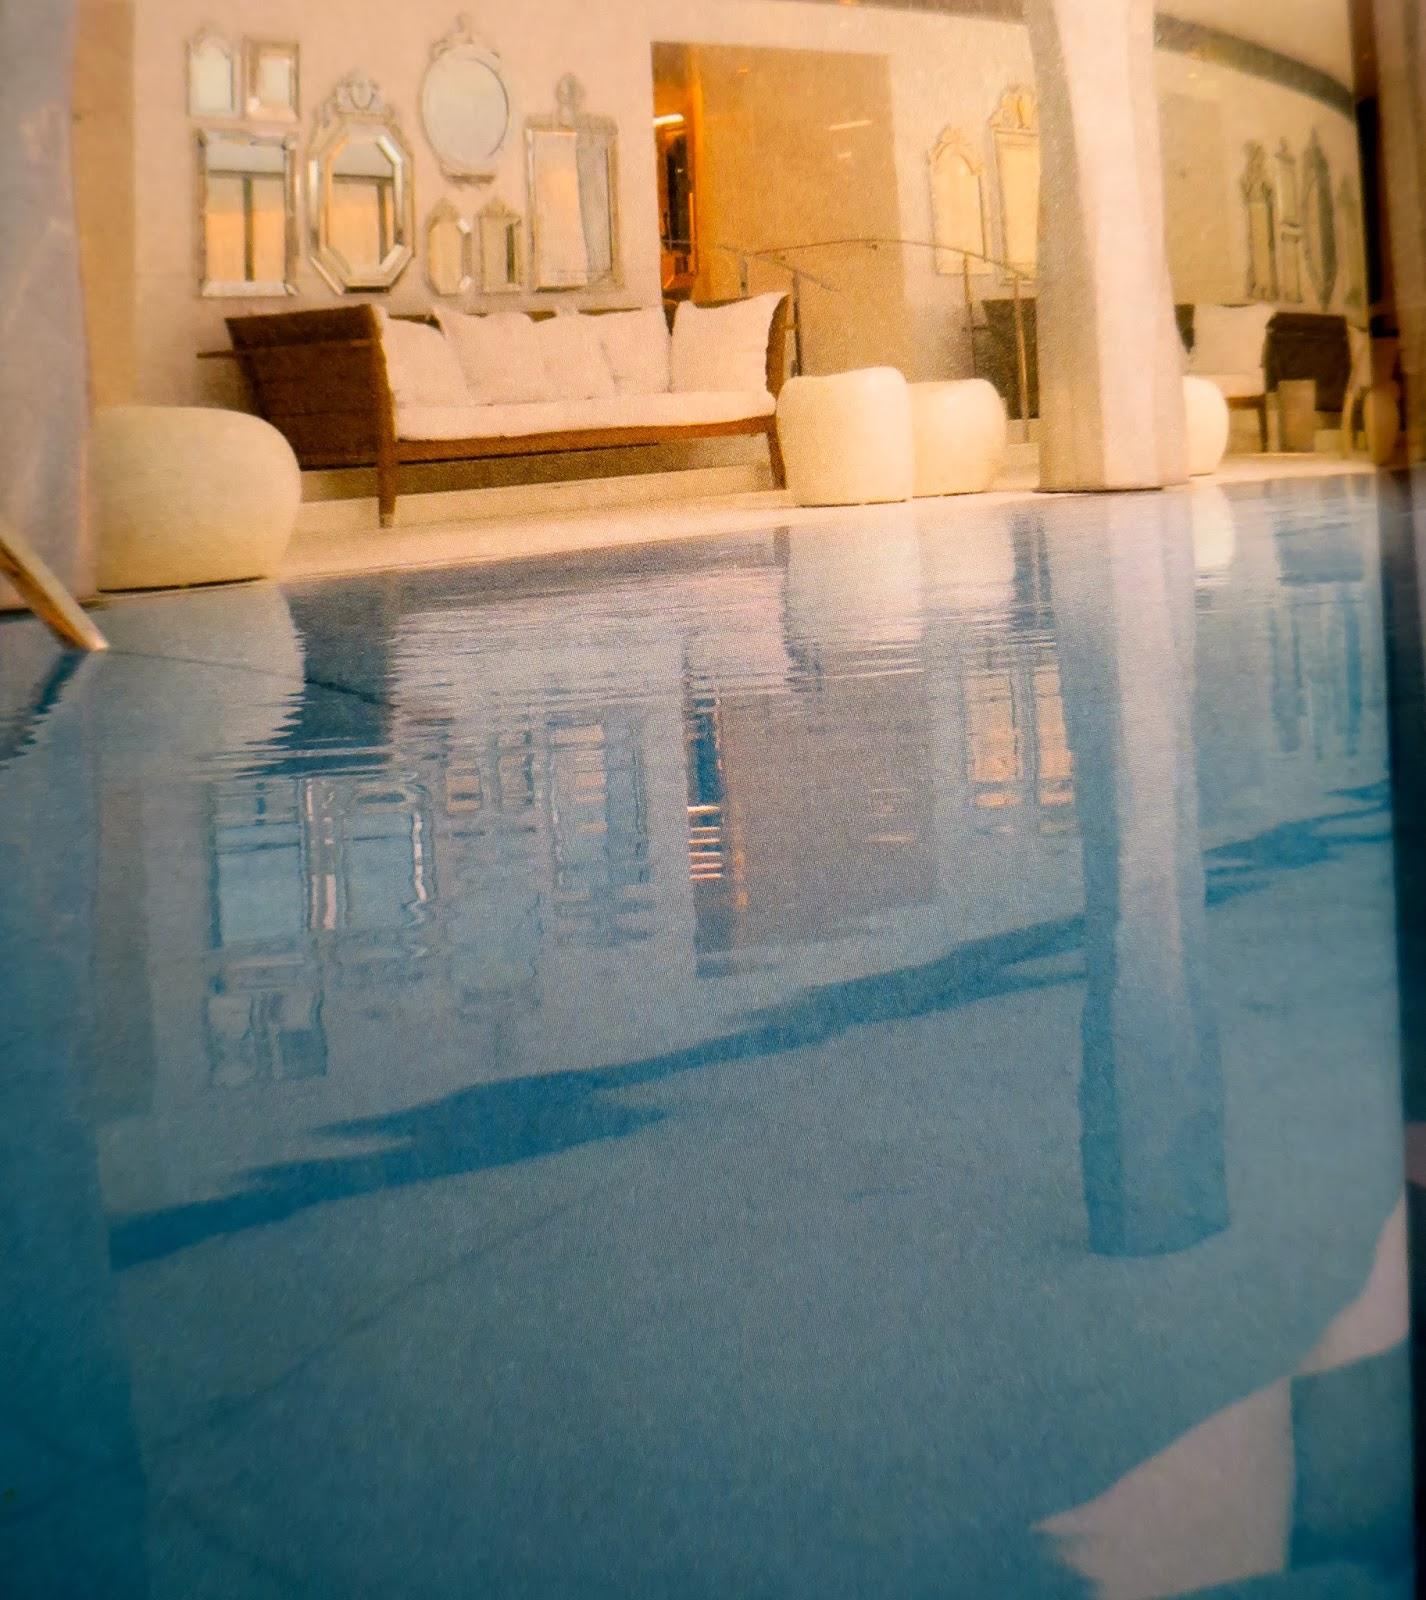 international luxury consulting clarins spa my blend cassandra moonen ferrera. Black Bedroom Furniture Sets. Home Design Ideas